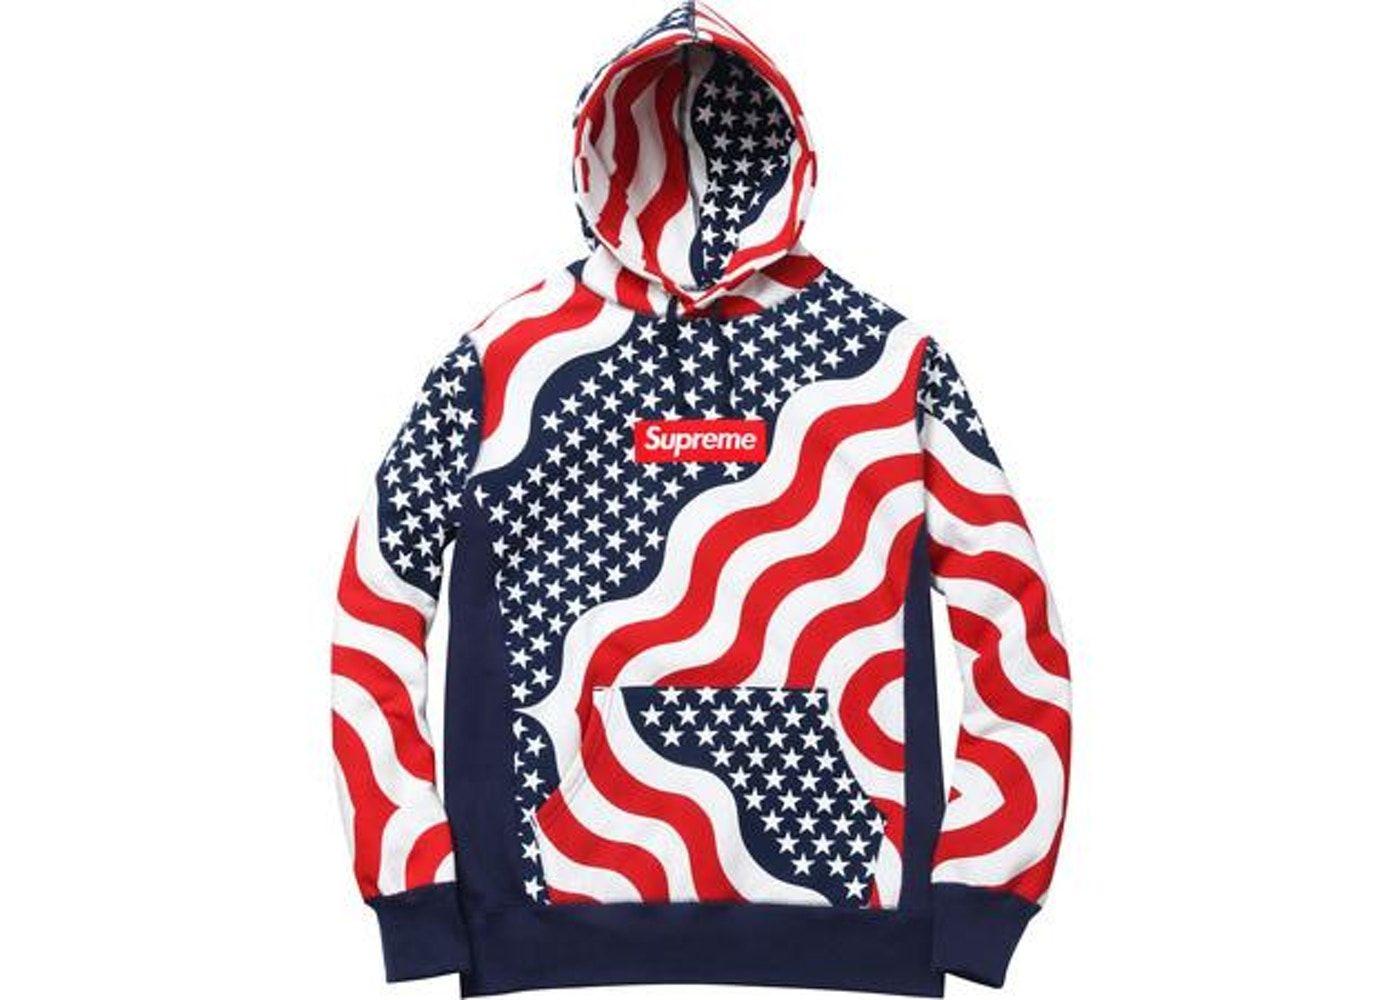 b4d30d9c46 Supreme Box Logo Pullover Hoodie Multi in 2019 | Clothes | Supreme ...